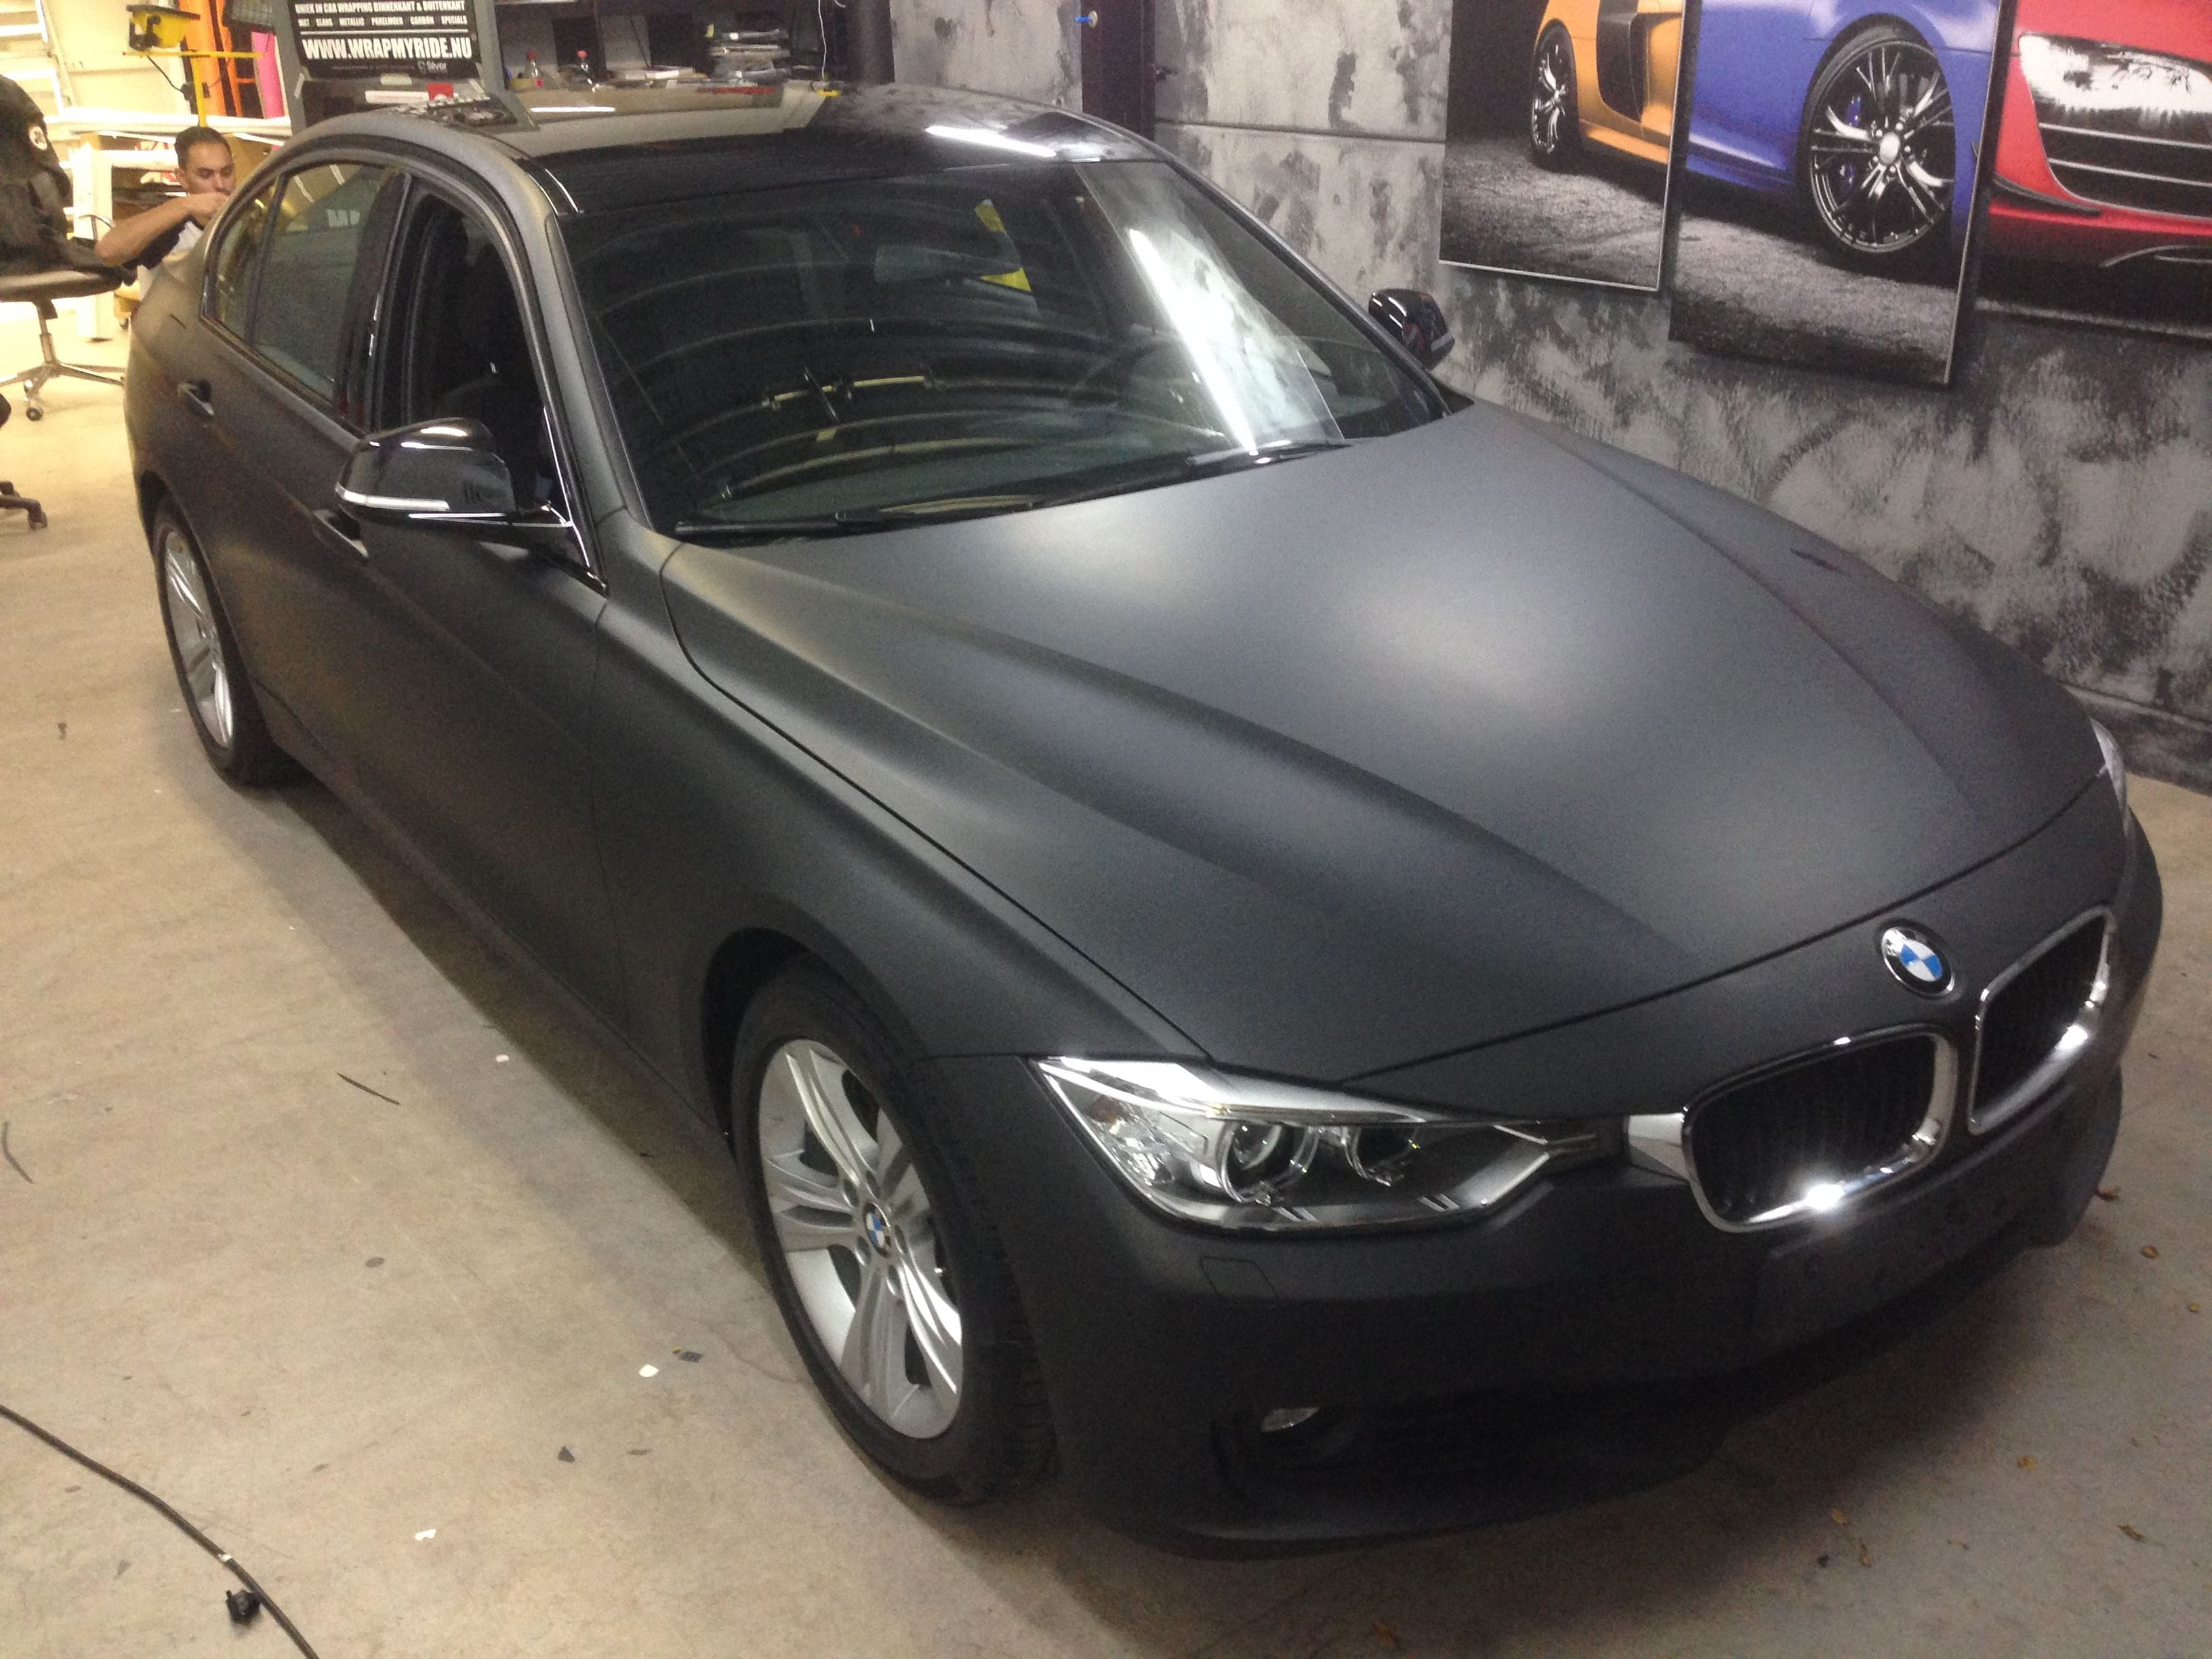 BMW E92 3 Serie met Mat Zwarte Wrap, Carwrapping door Wrapmyride.nu Foto-nr:5415, ©2020